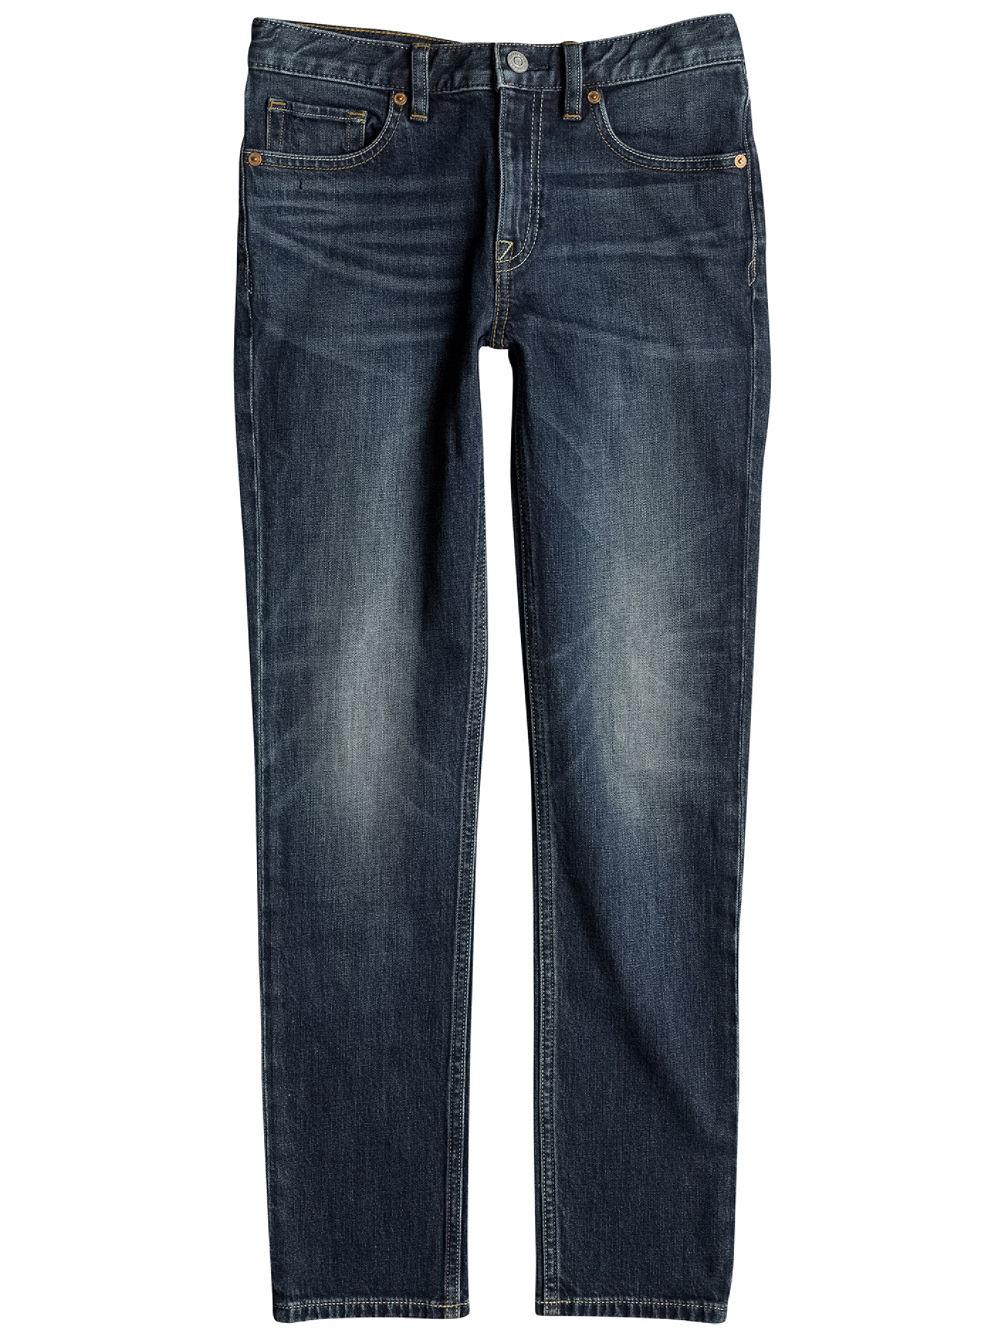 Buy DC Washed Slim Jeans Boys online at blue-tomato.com